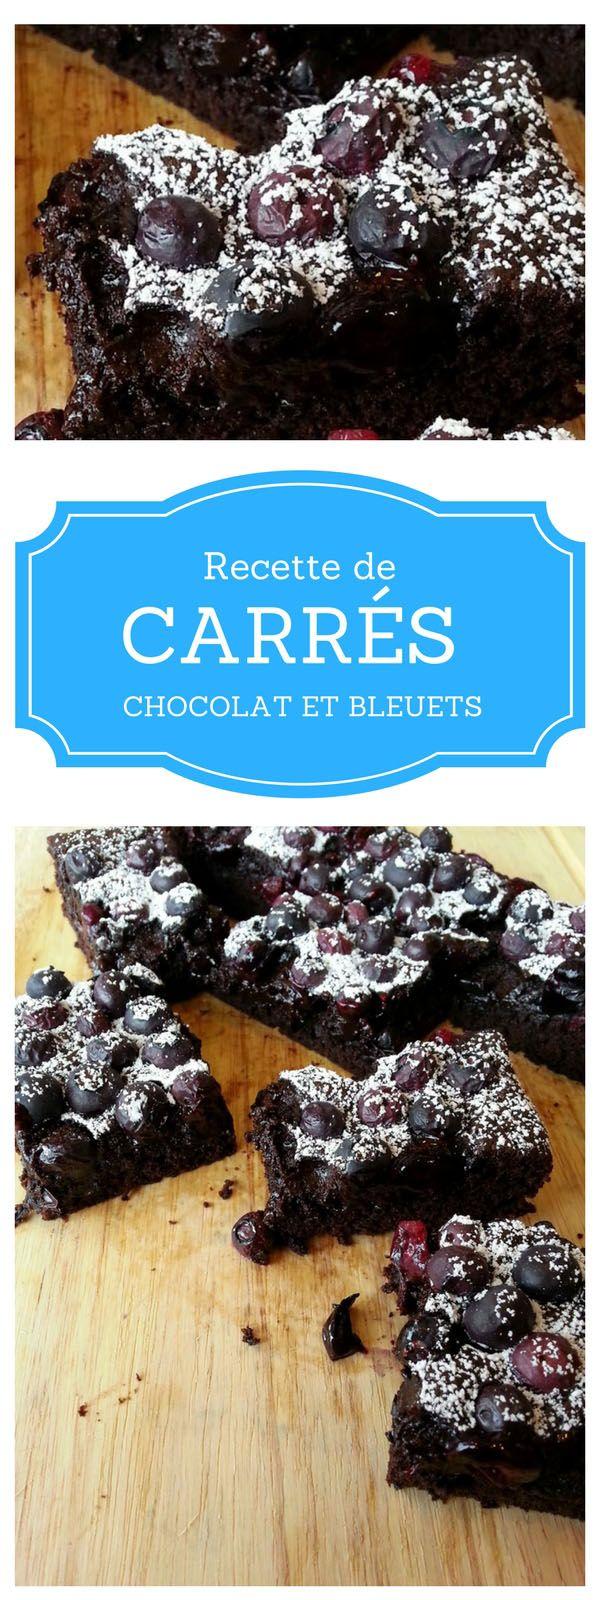 #chocolat #bleuet